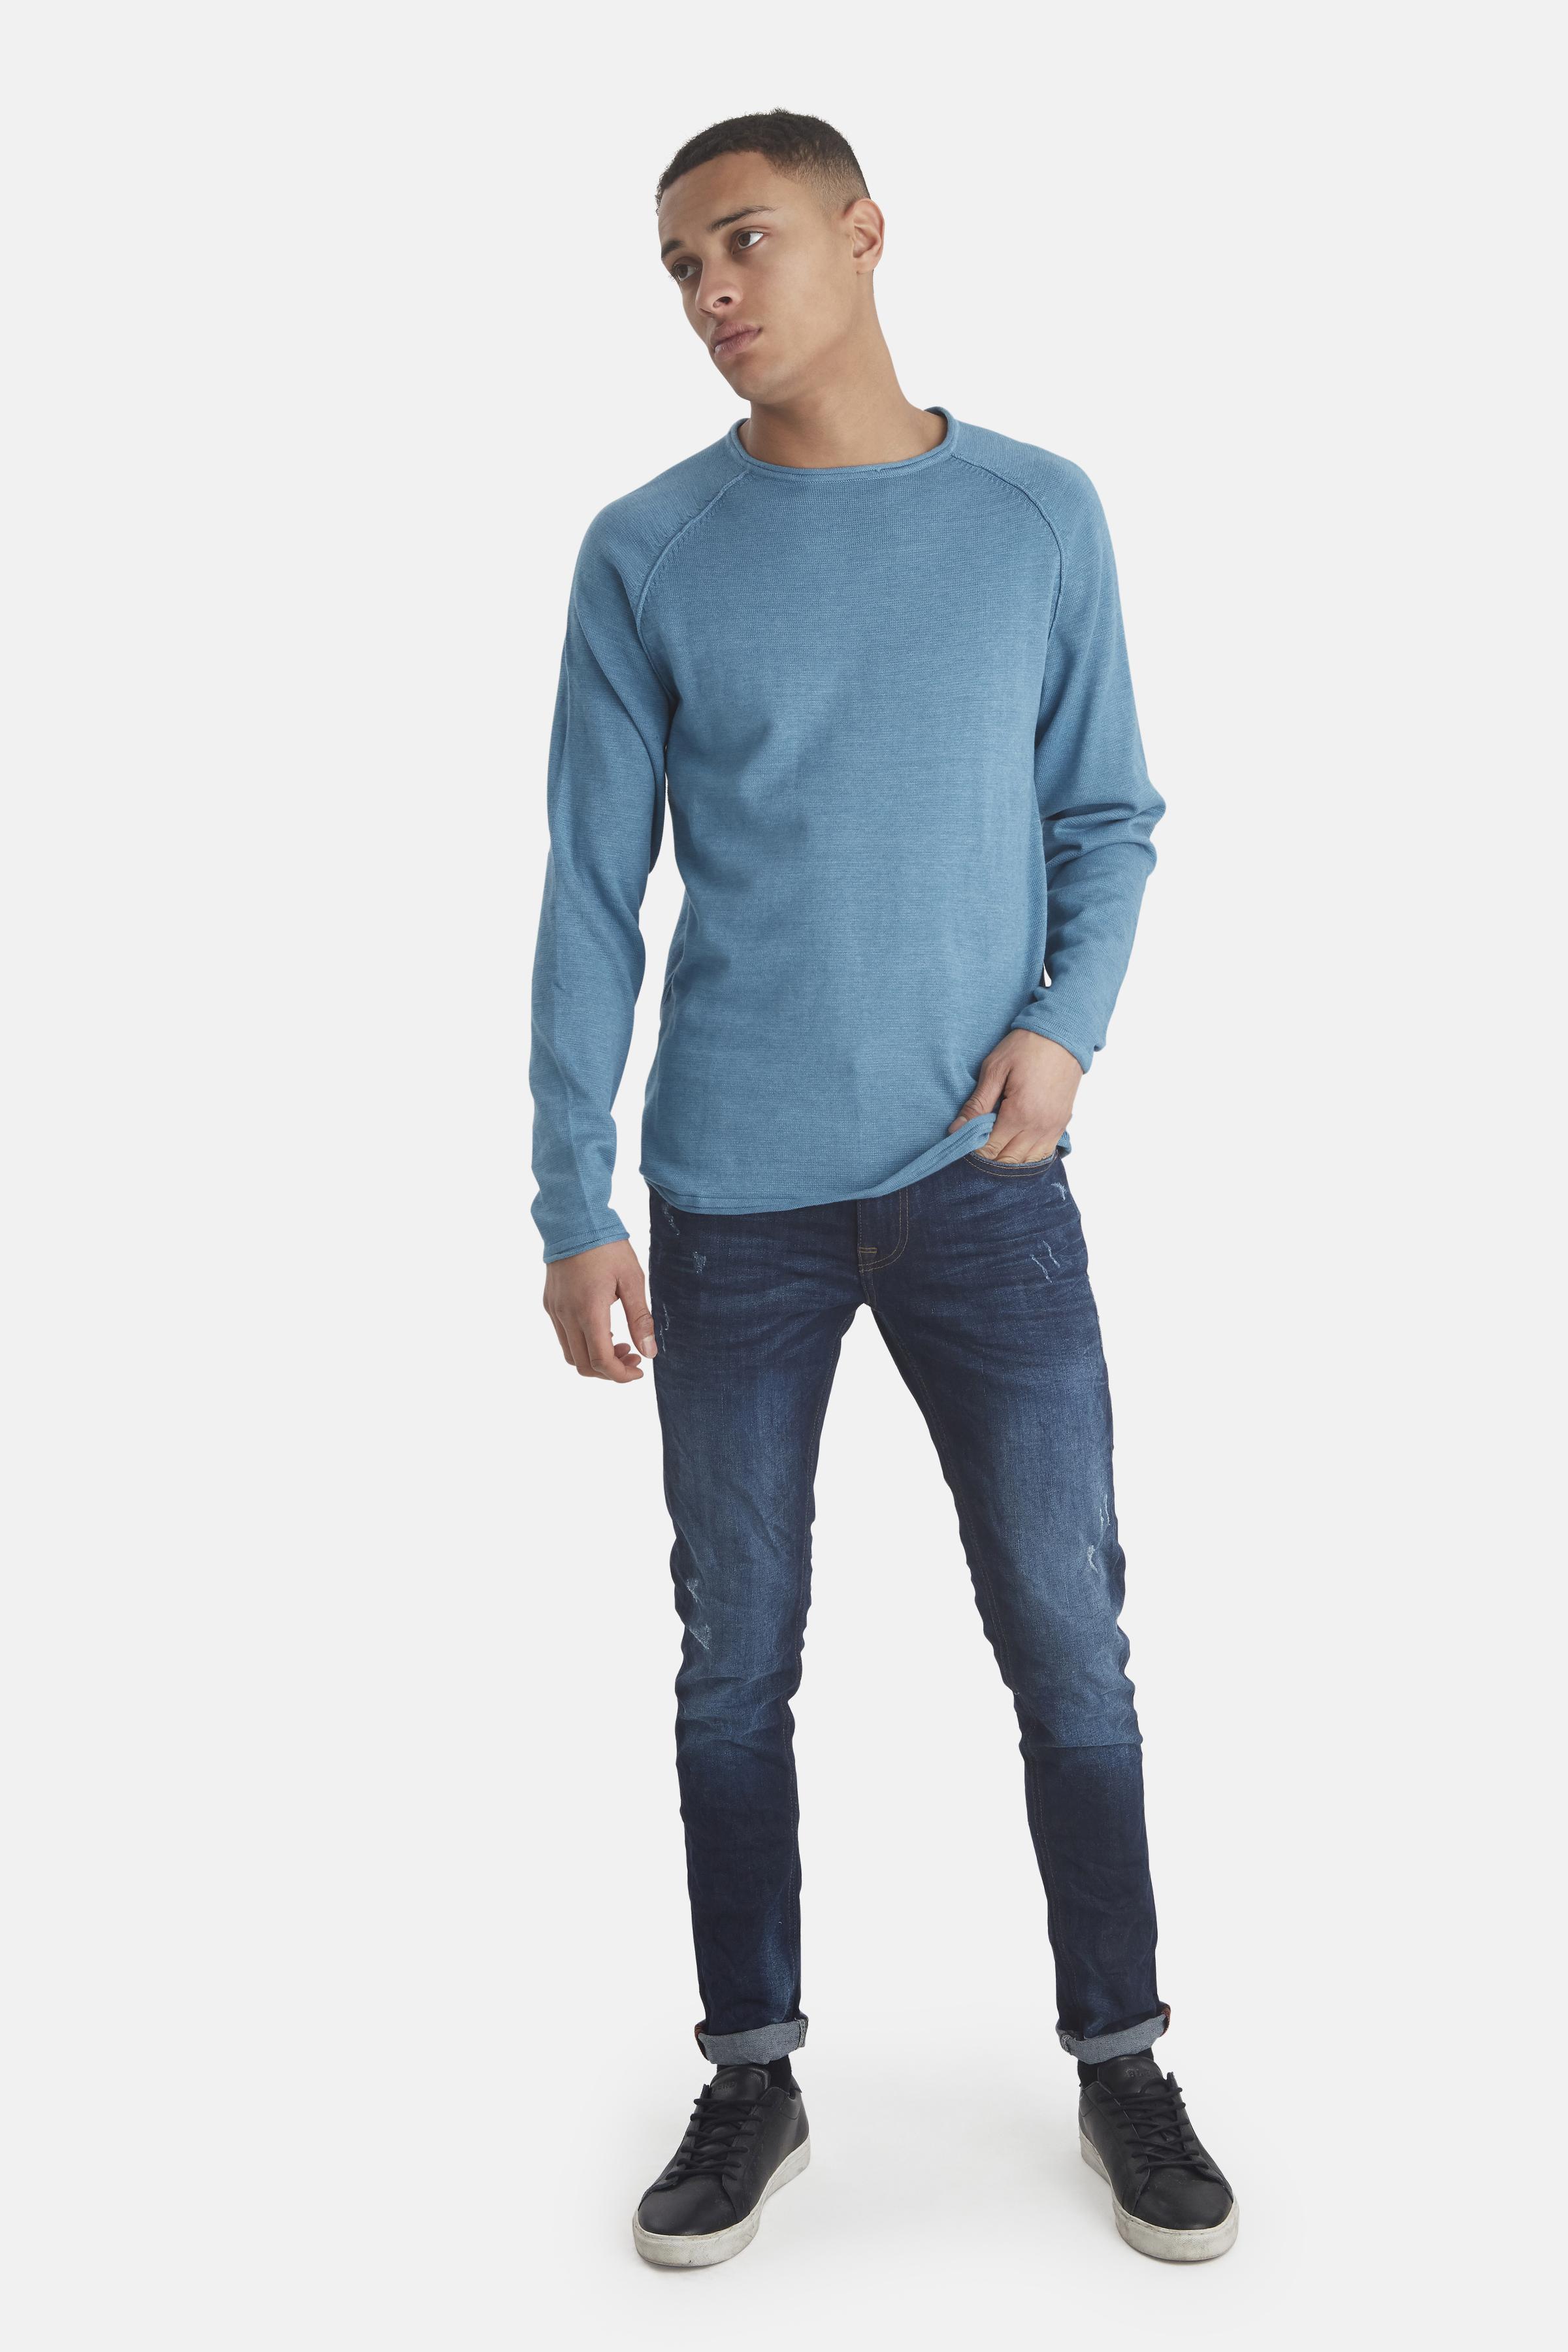 Niagara Blue Strikpullover – Køb Niagara Blue Strikpullover fra str. S-XXL her